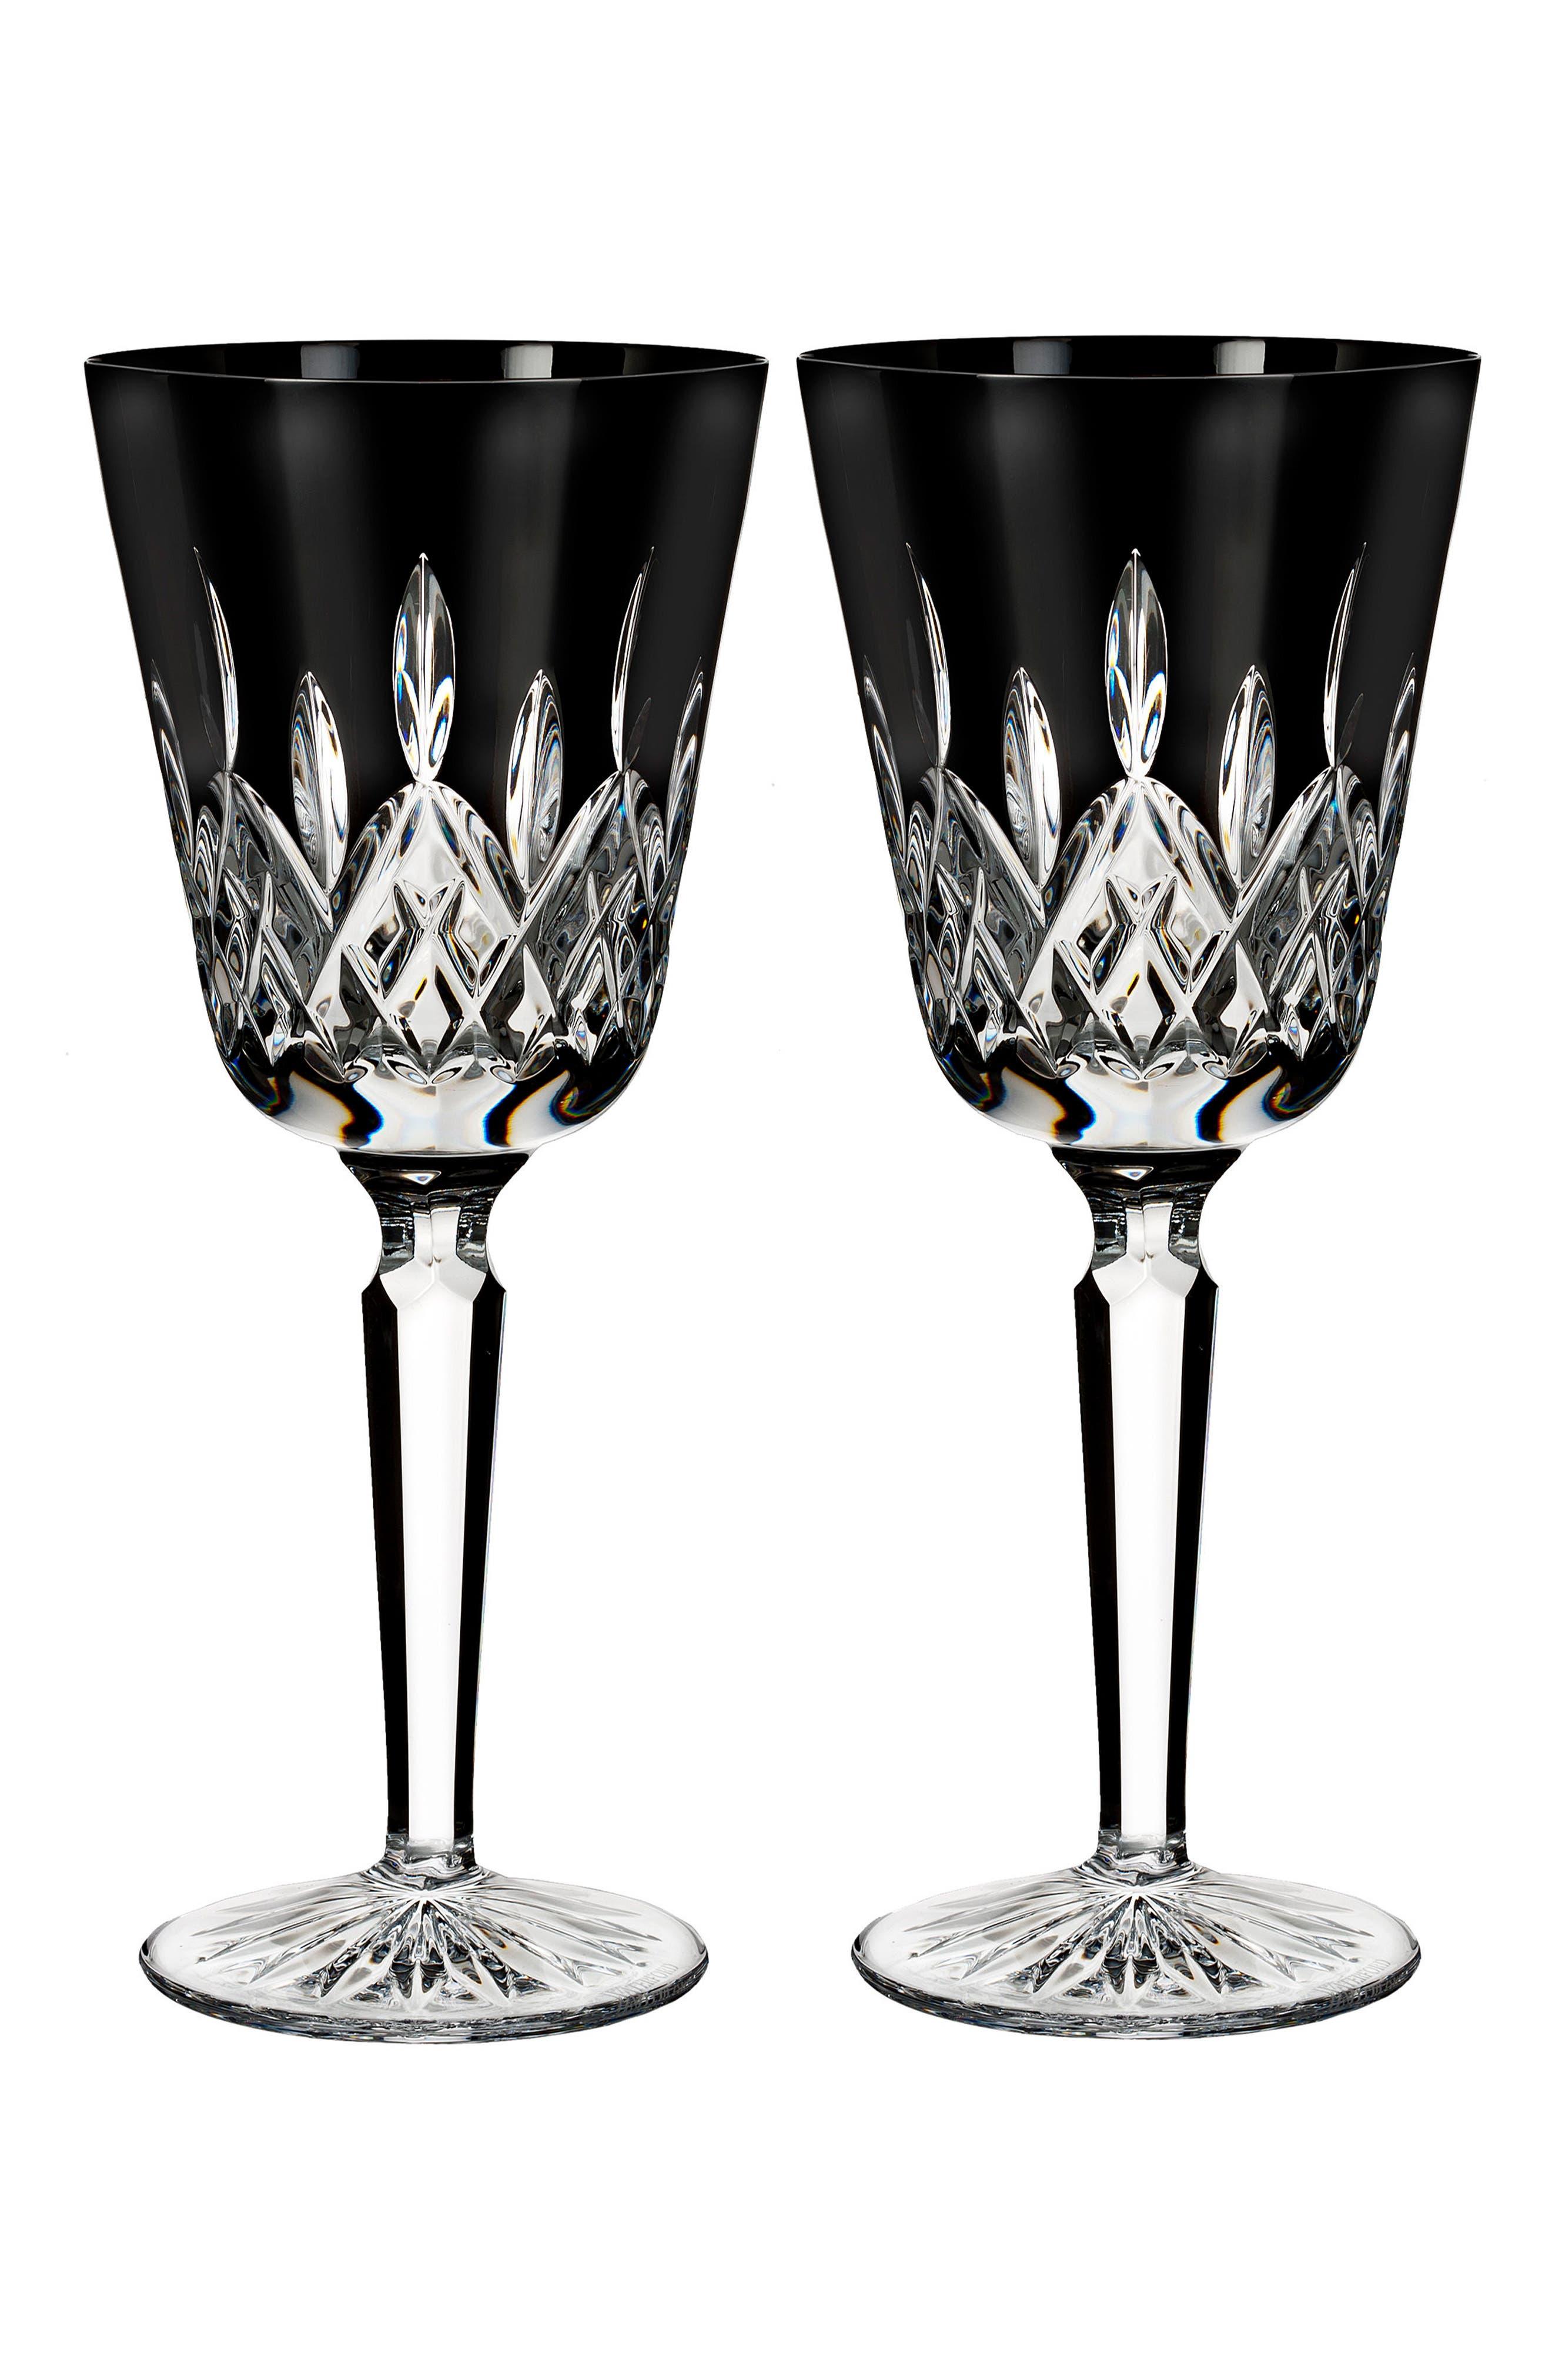 Alternate Image 1 Selected - Waterford Lismore Diamond Set of 2 Black Lead Crystal Goblets